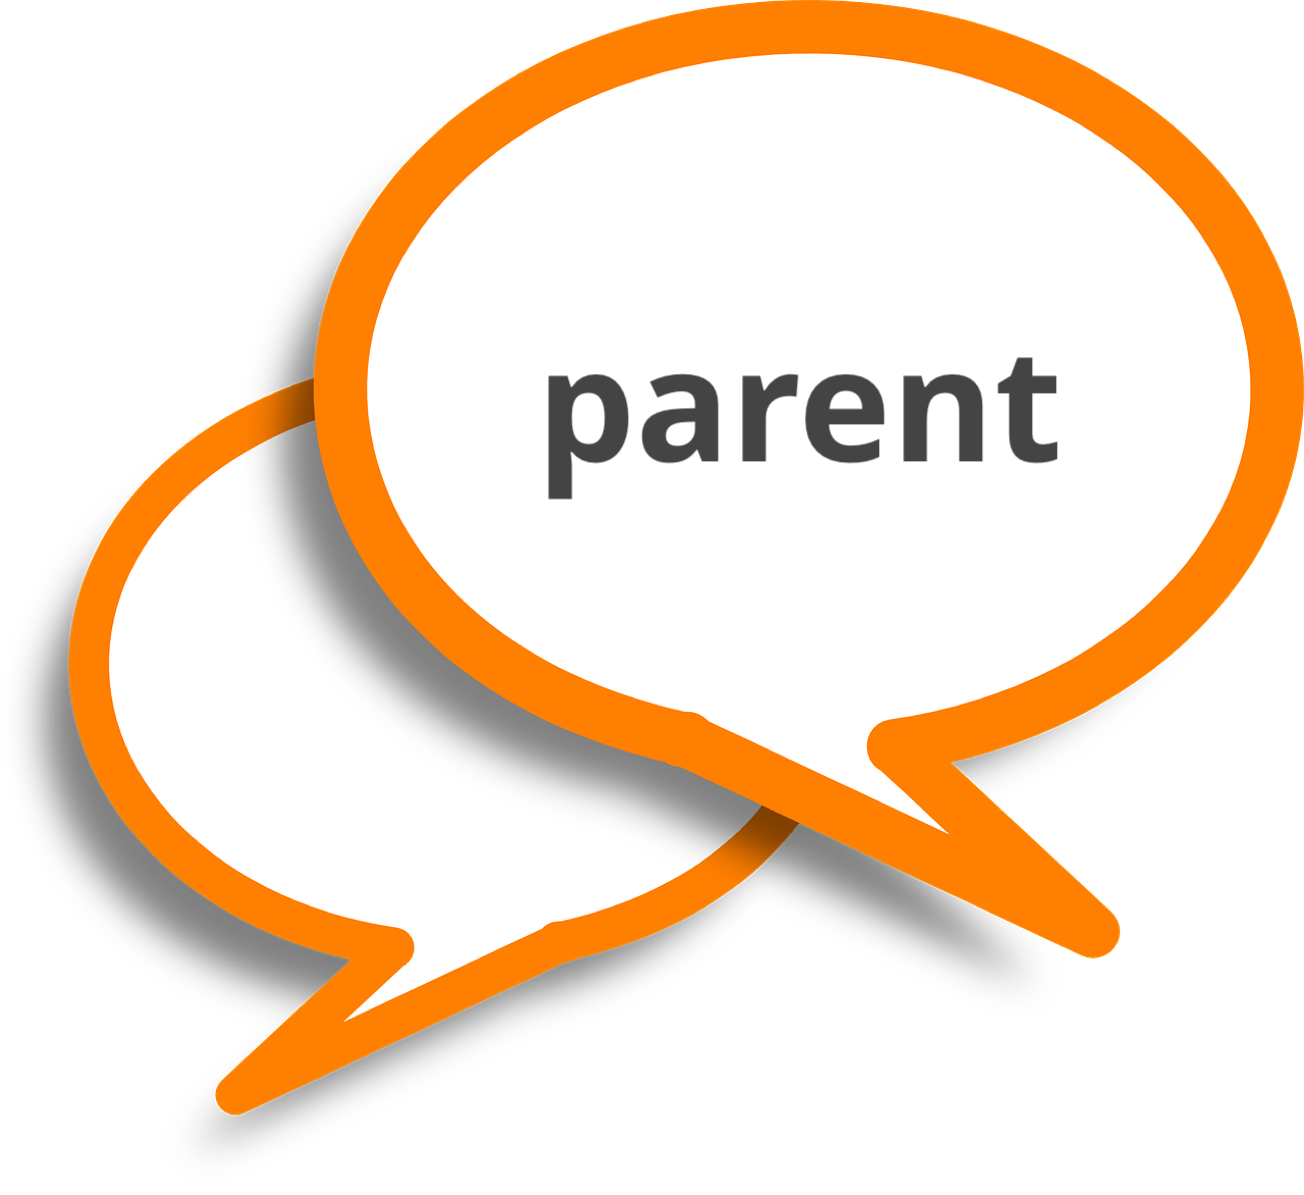 Knowledge clipart school culture. Script talking through technology